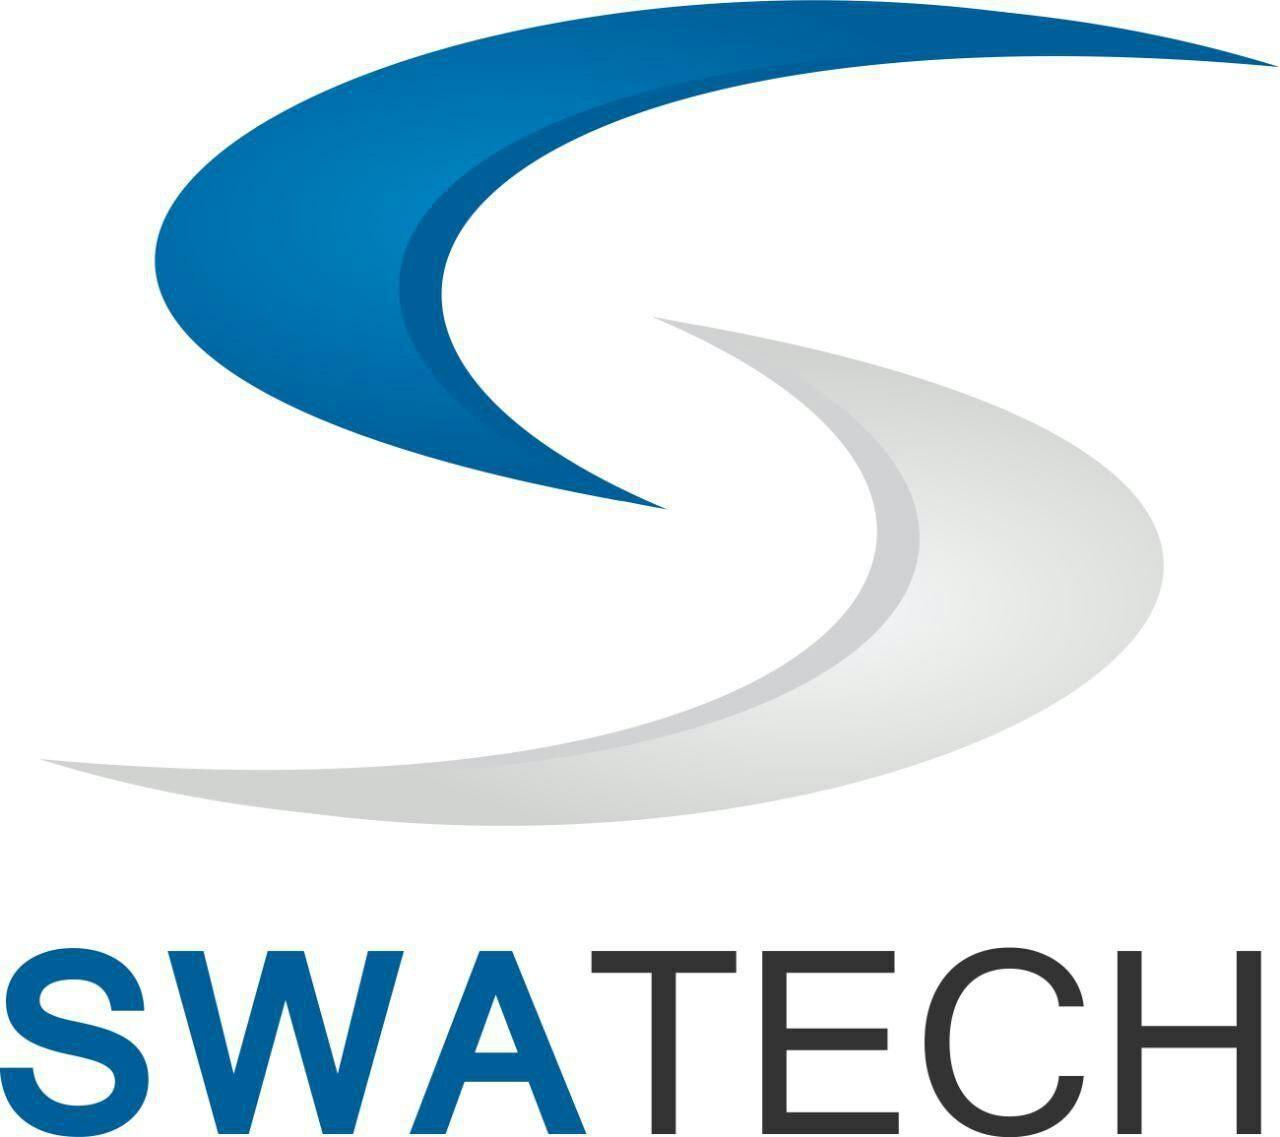 SwaTech